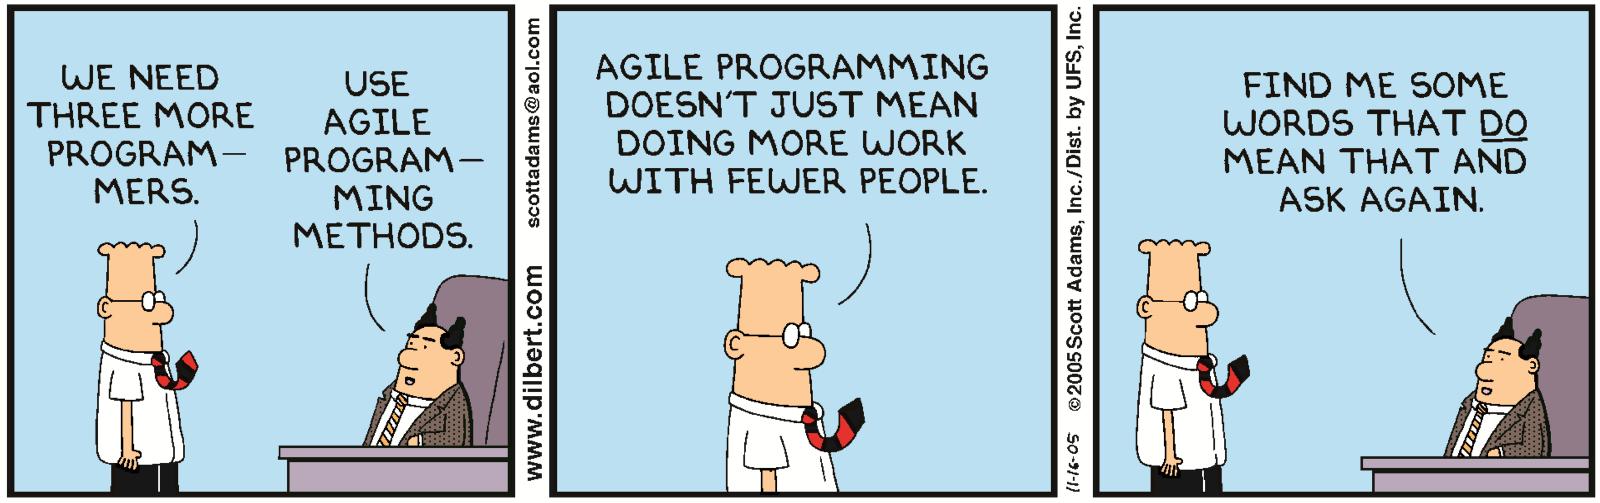 agile metrics meaning